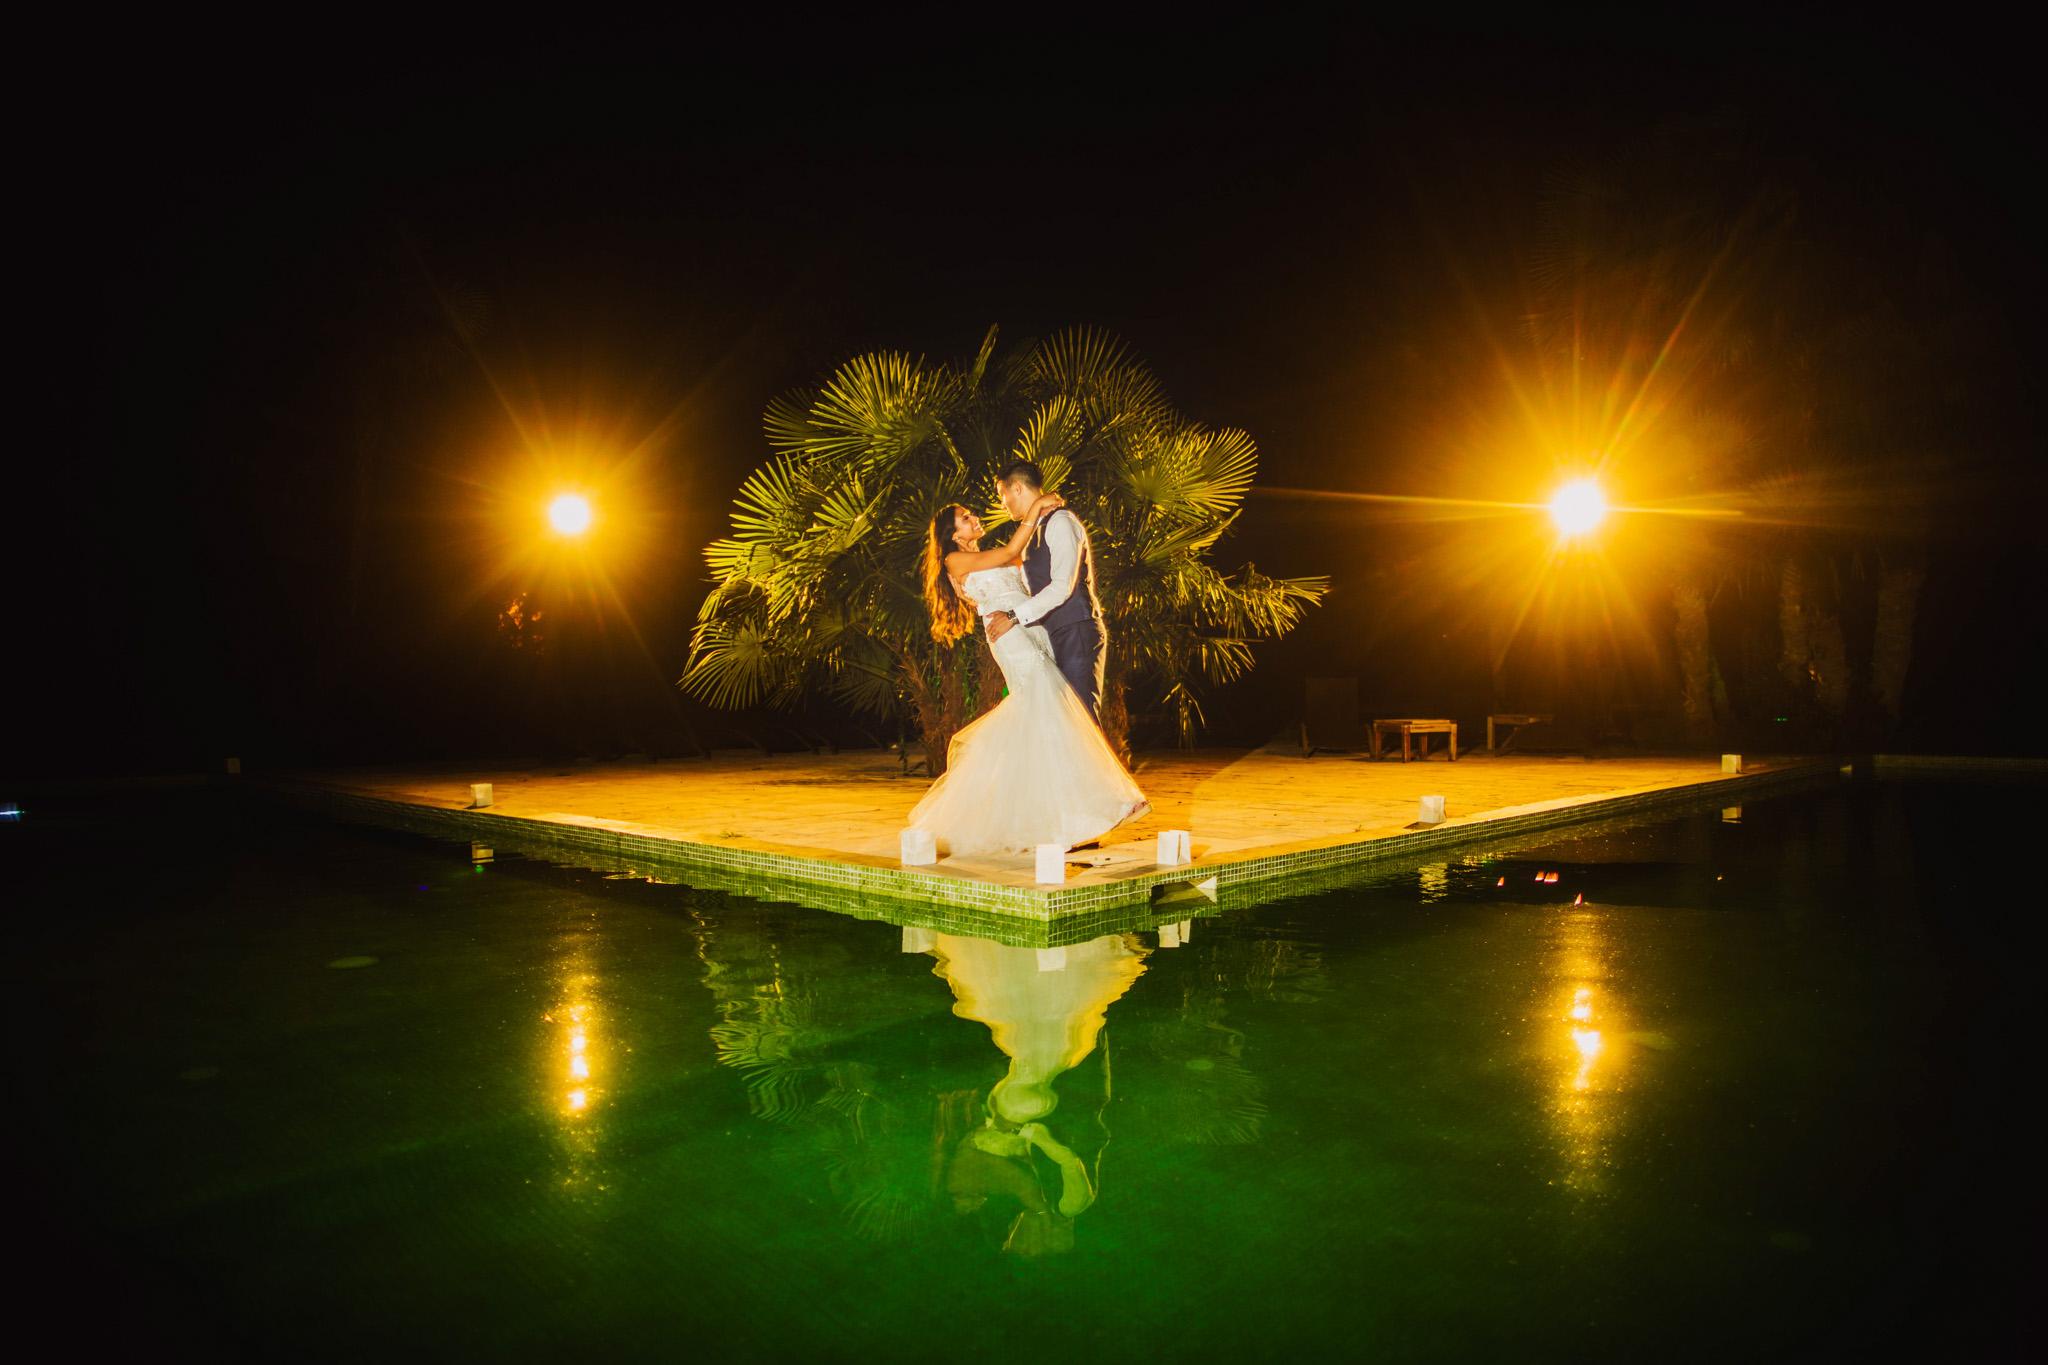 Mas Merlet Nimes South of France: Sabrina and Olivier wedding photography